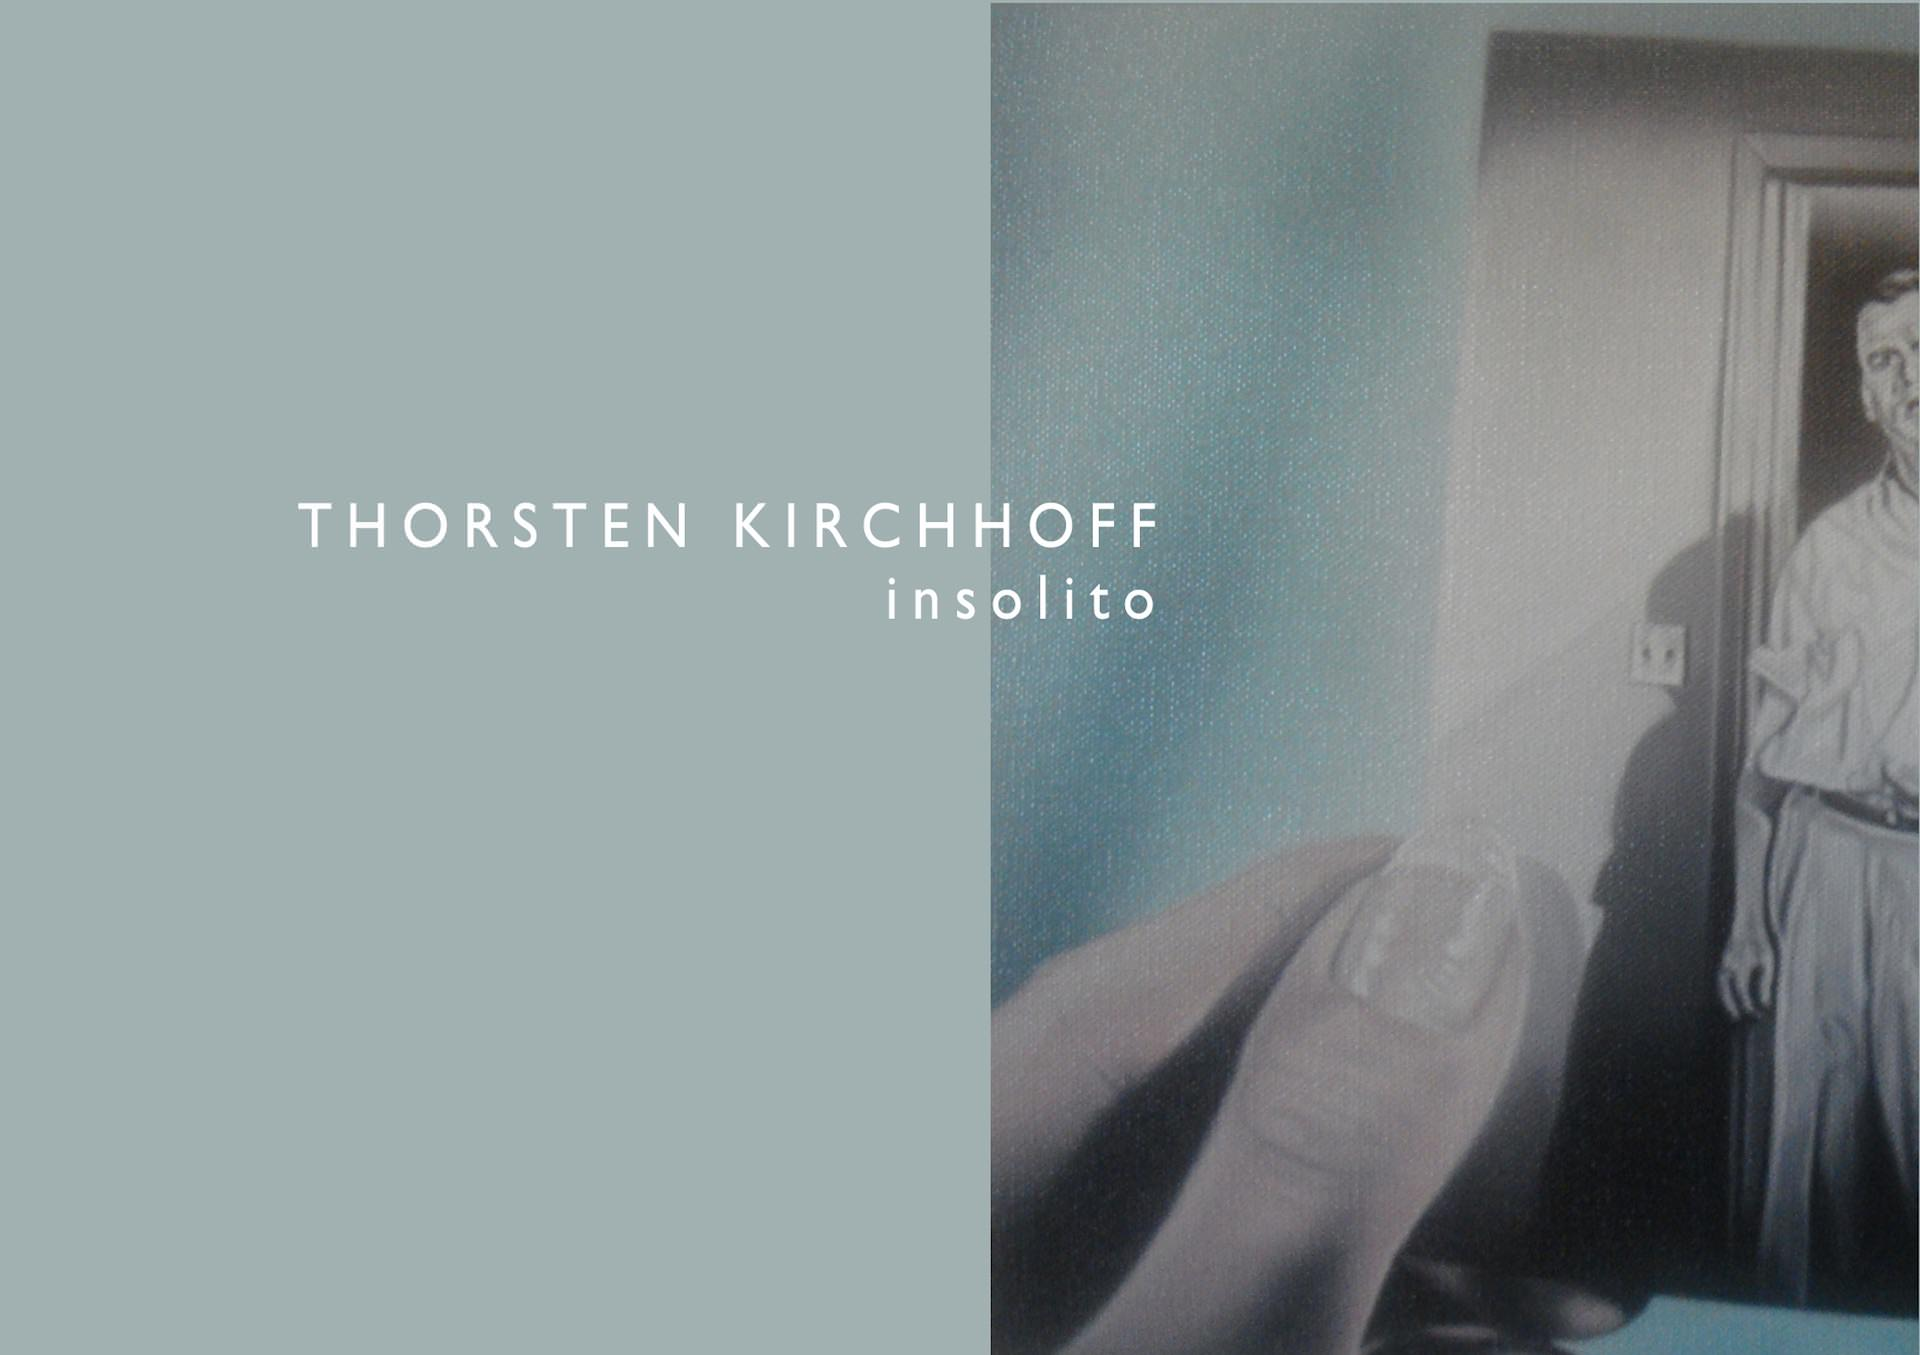 Thorsten Kirchhoff – Insolito